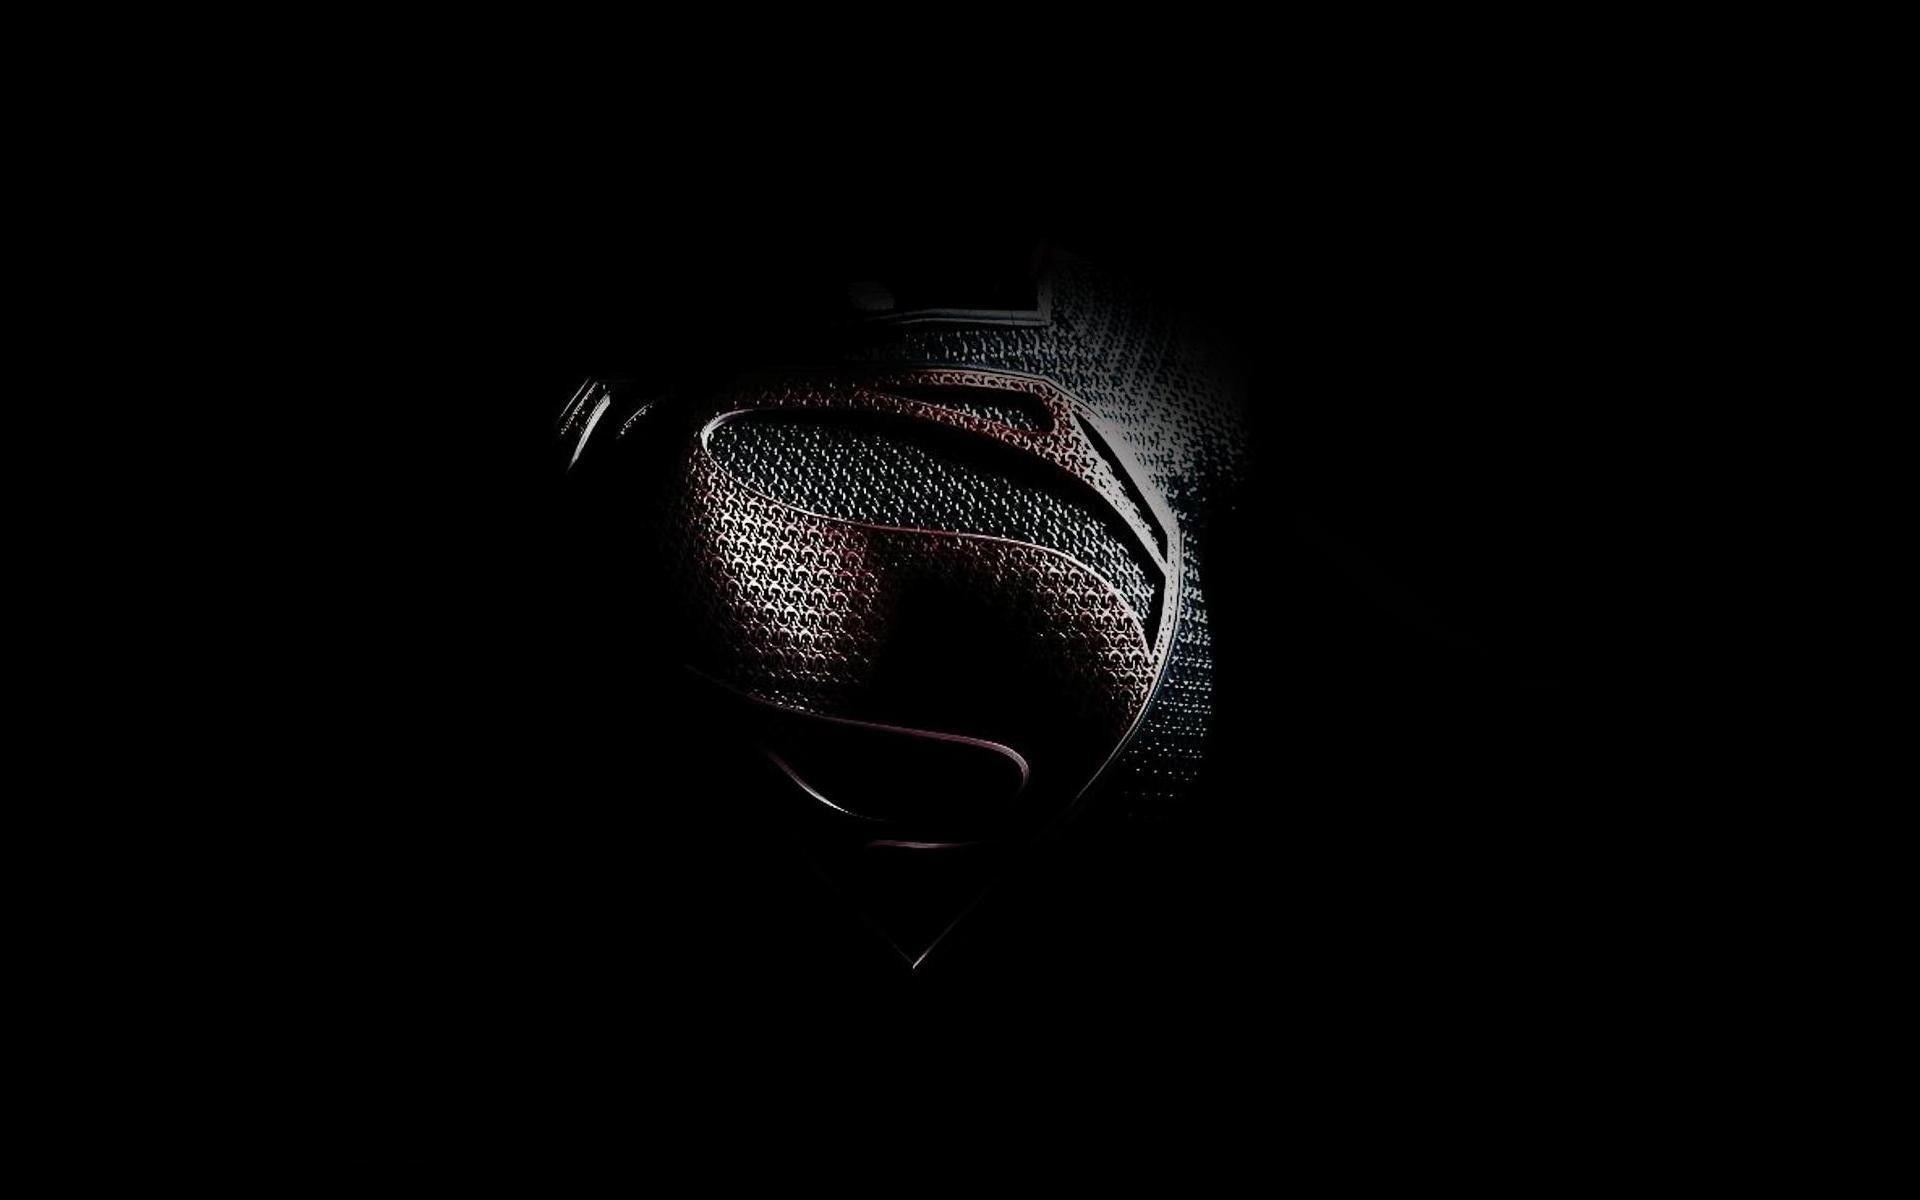 Dark Superman Wallpaper 71 Images